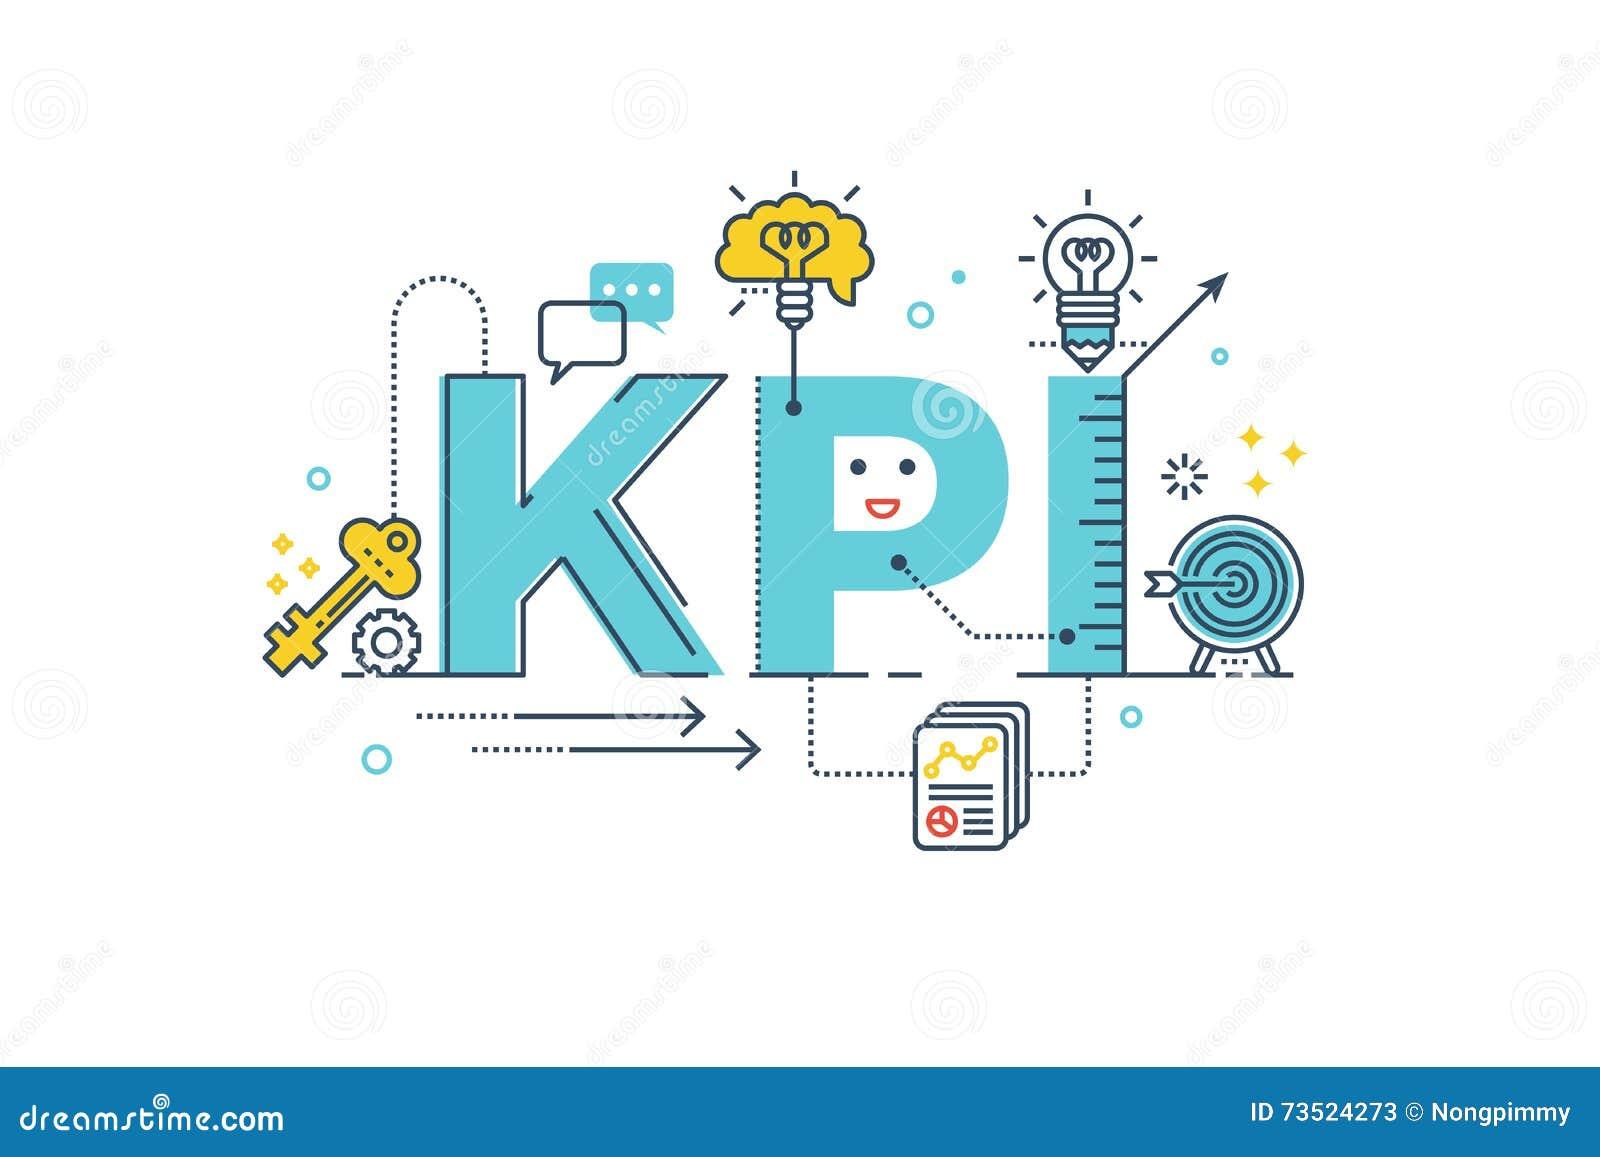 key performance indicator vector illustration